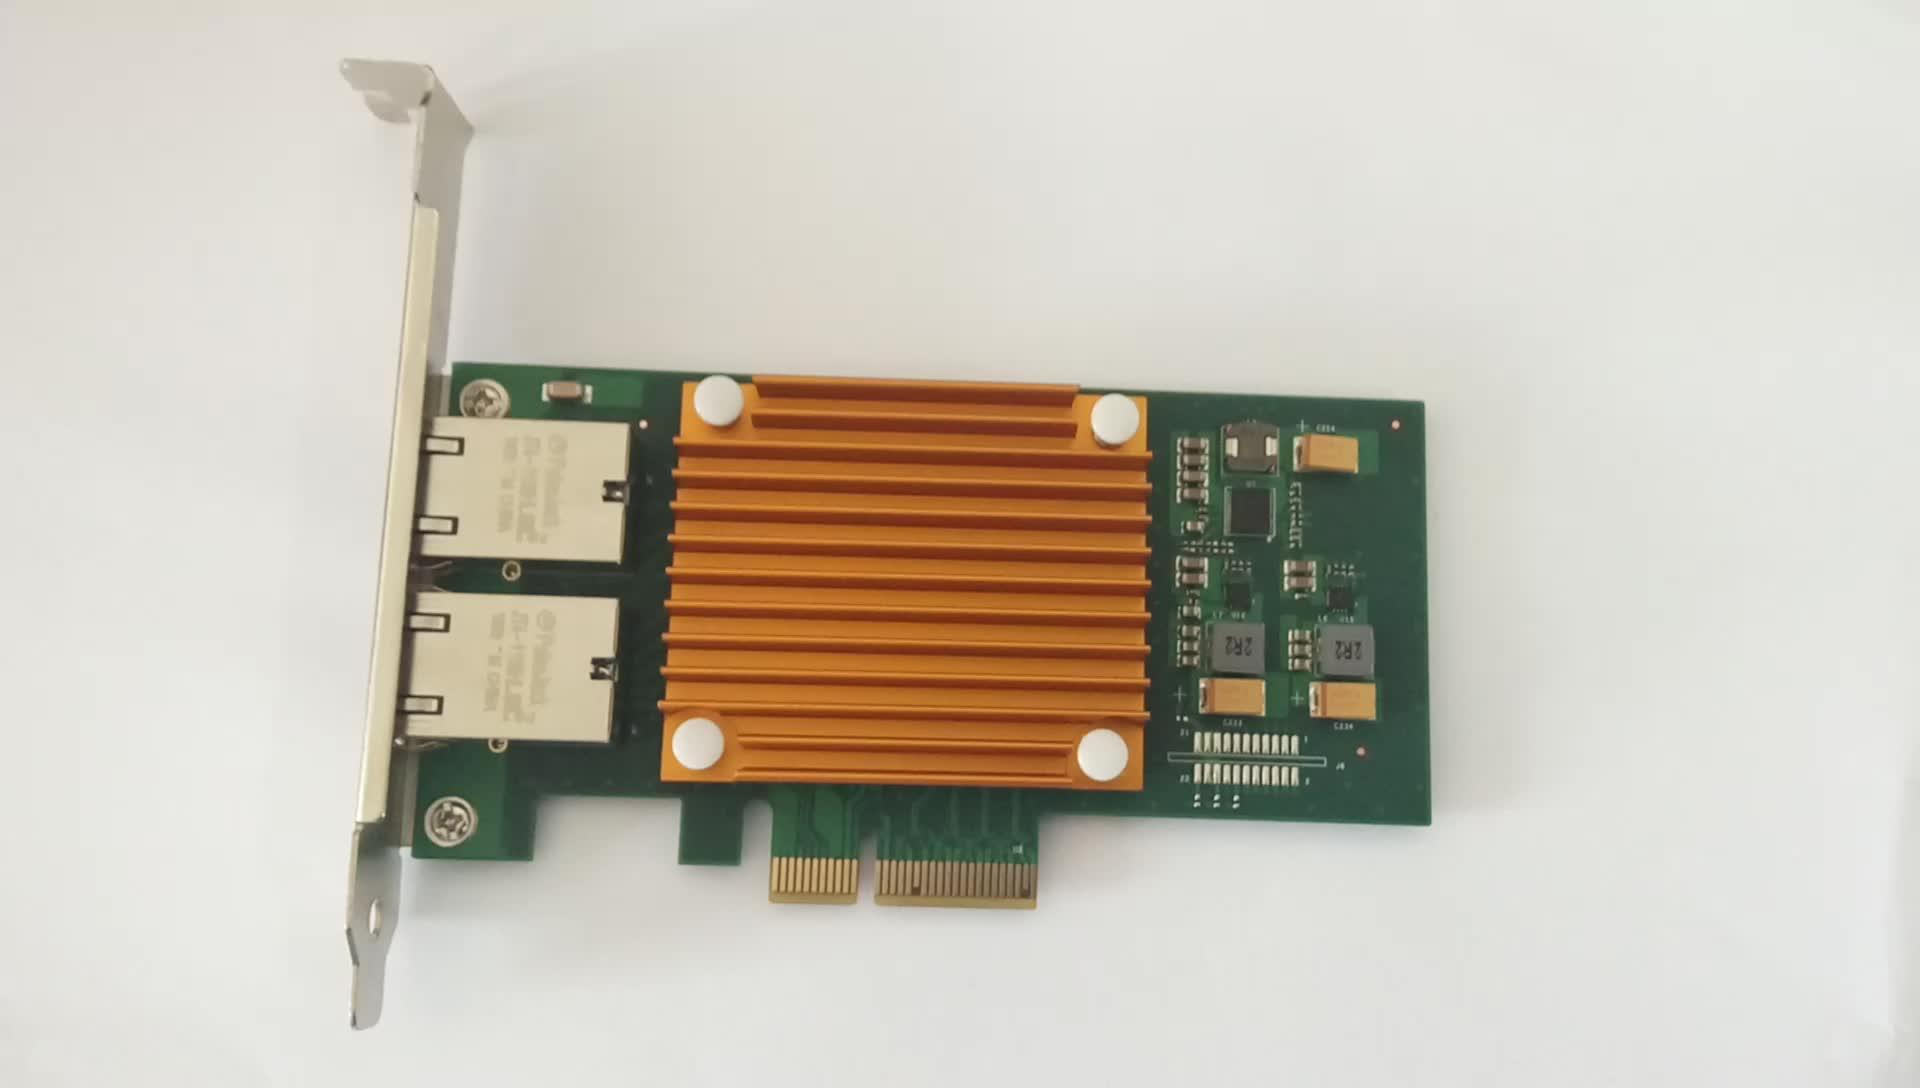 F1002T Ver3.0 Dual Port Copper 10 Gigabit Ethernet PCI Express Server Adapter Intel X550-AT2 Based